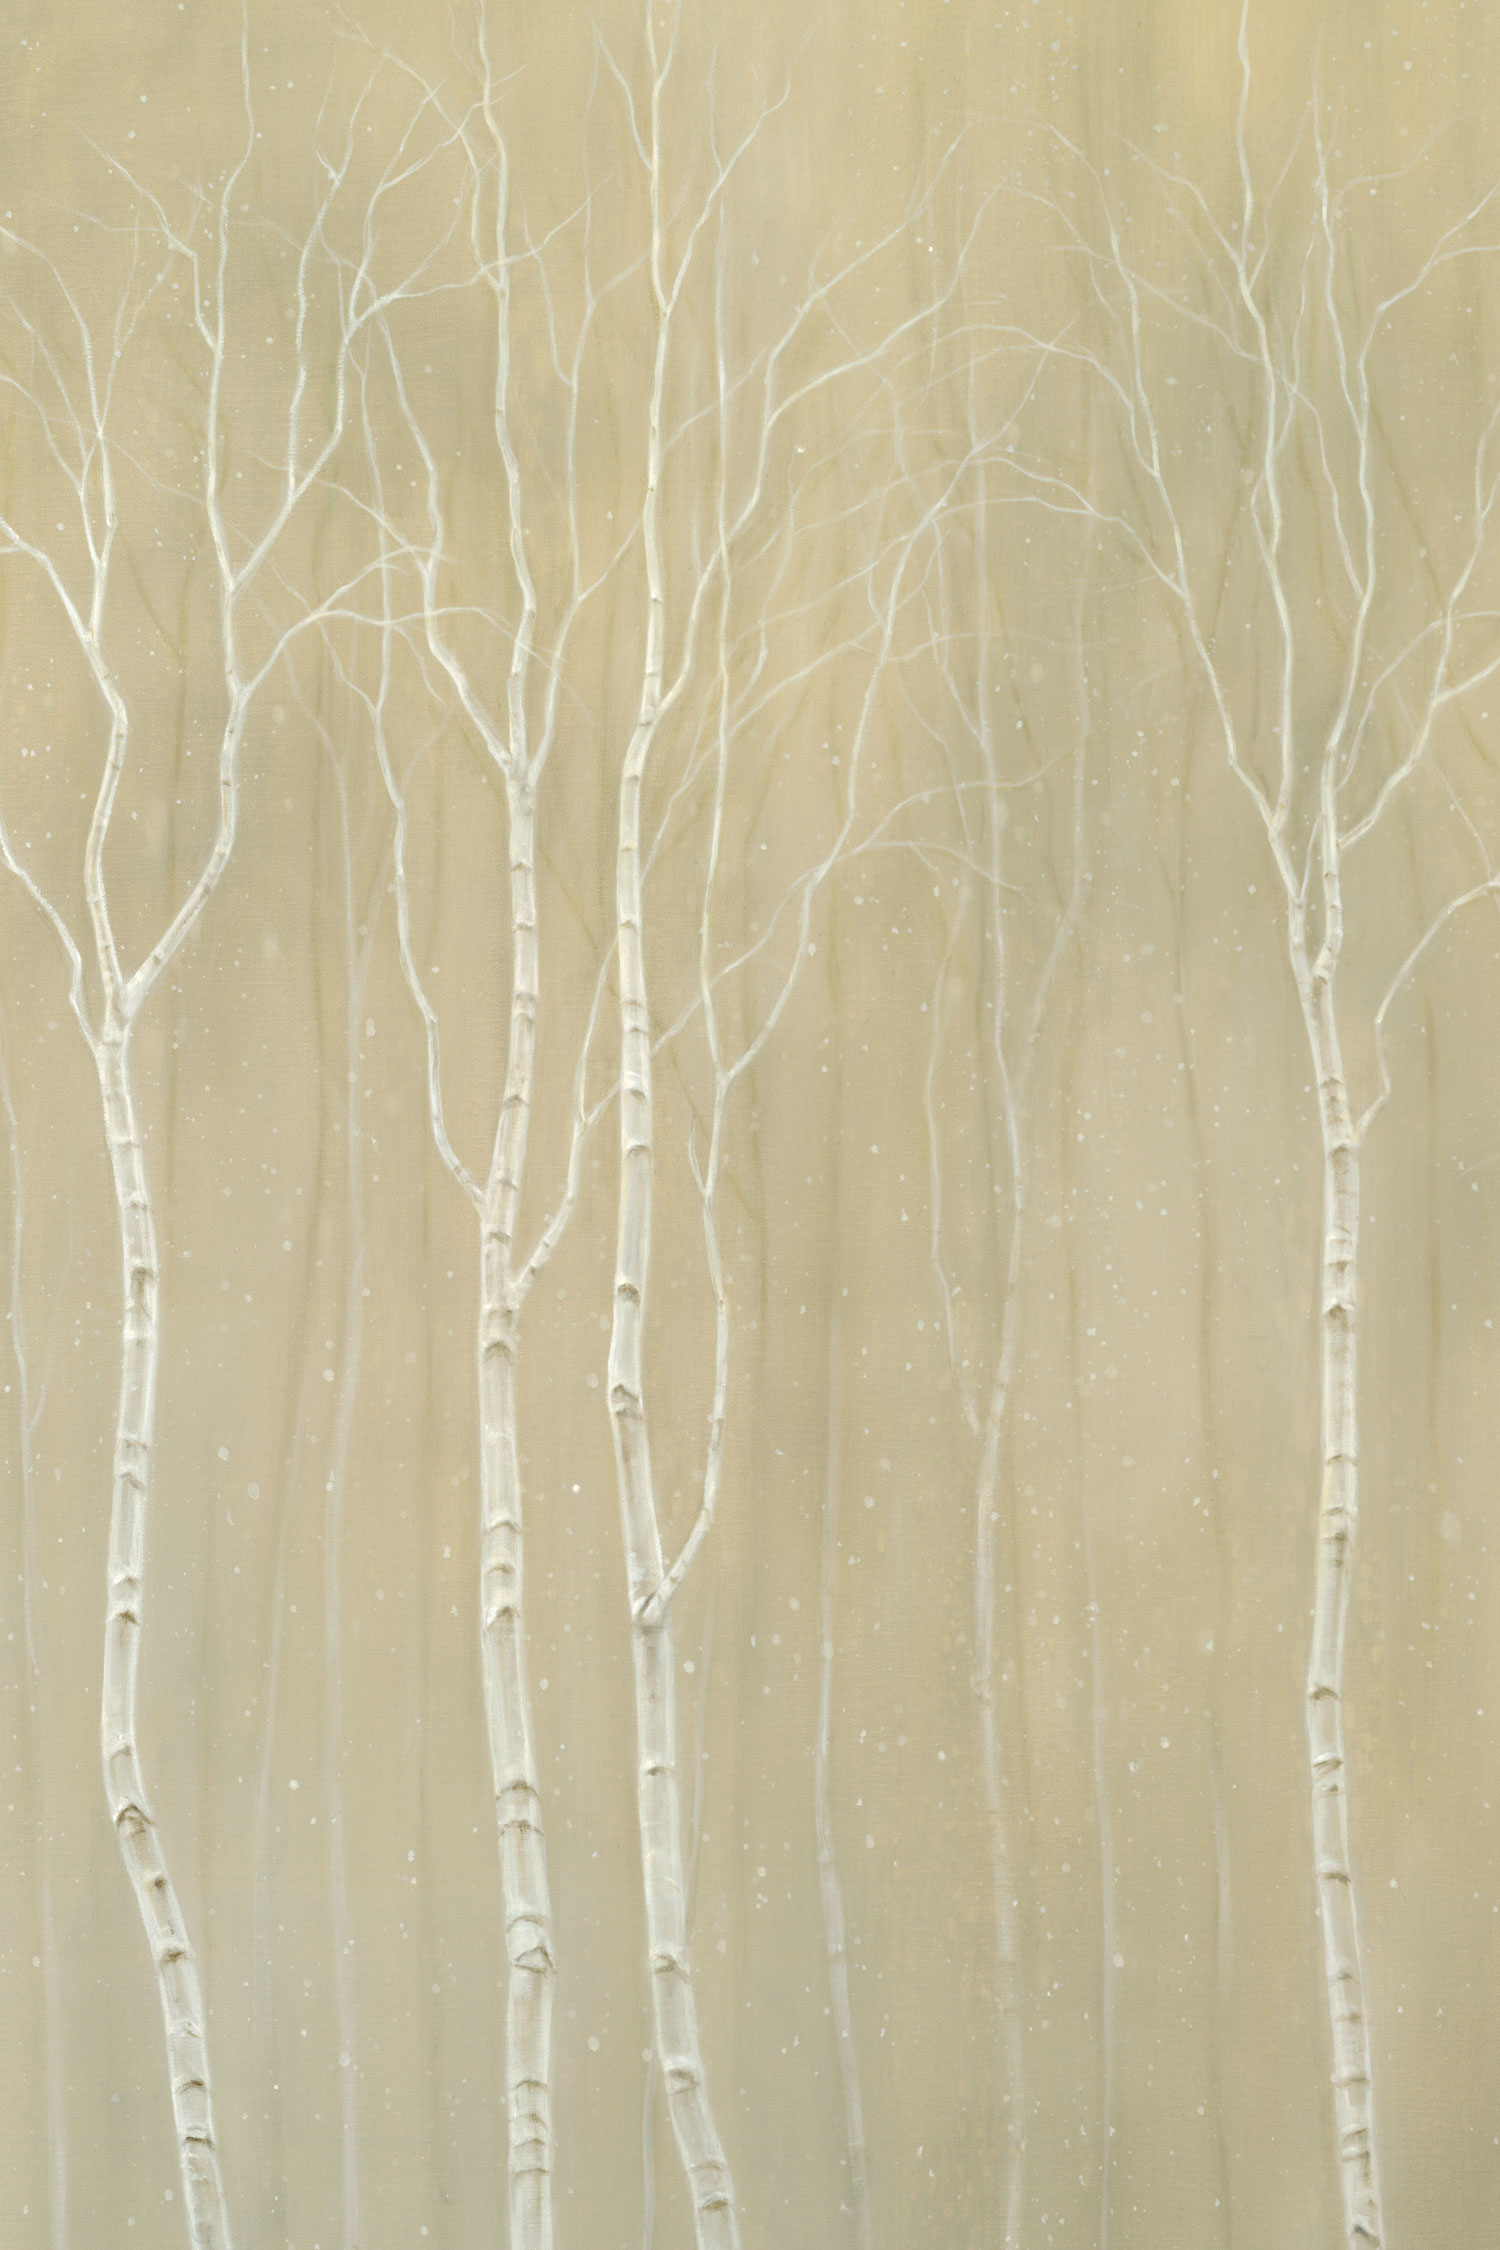 Snowy Birch Grove (detail)